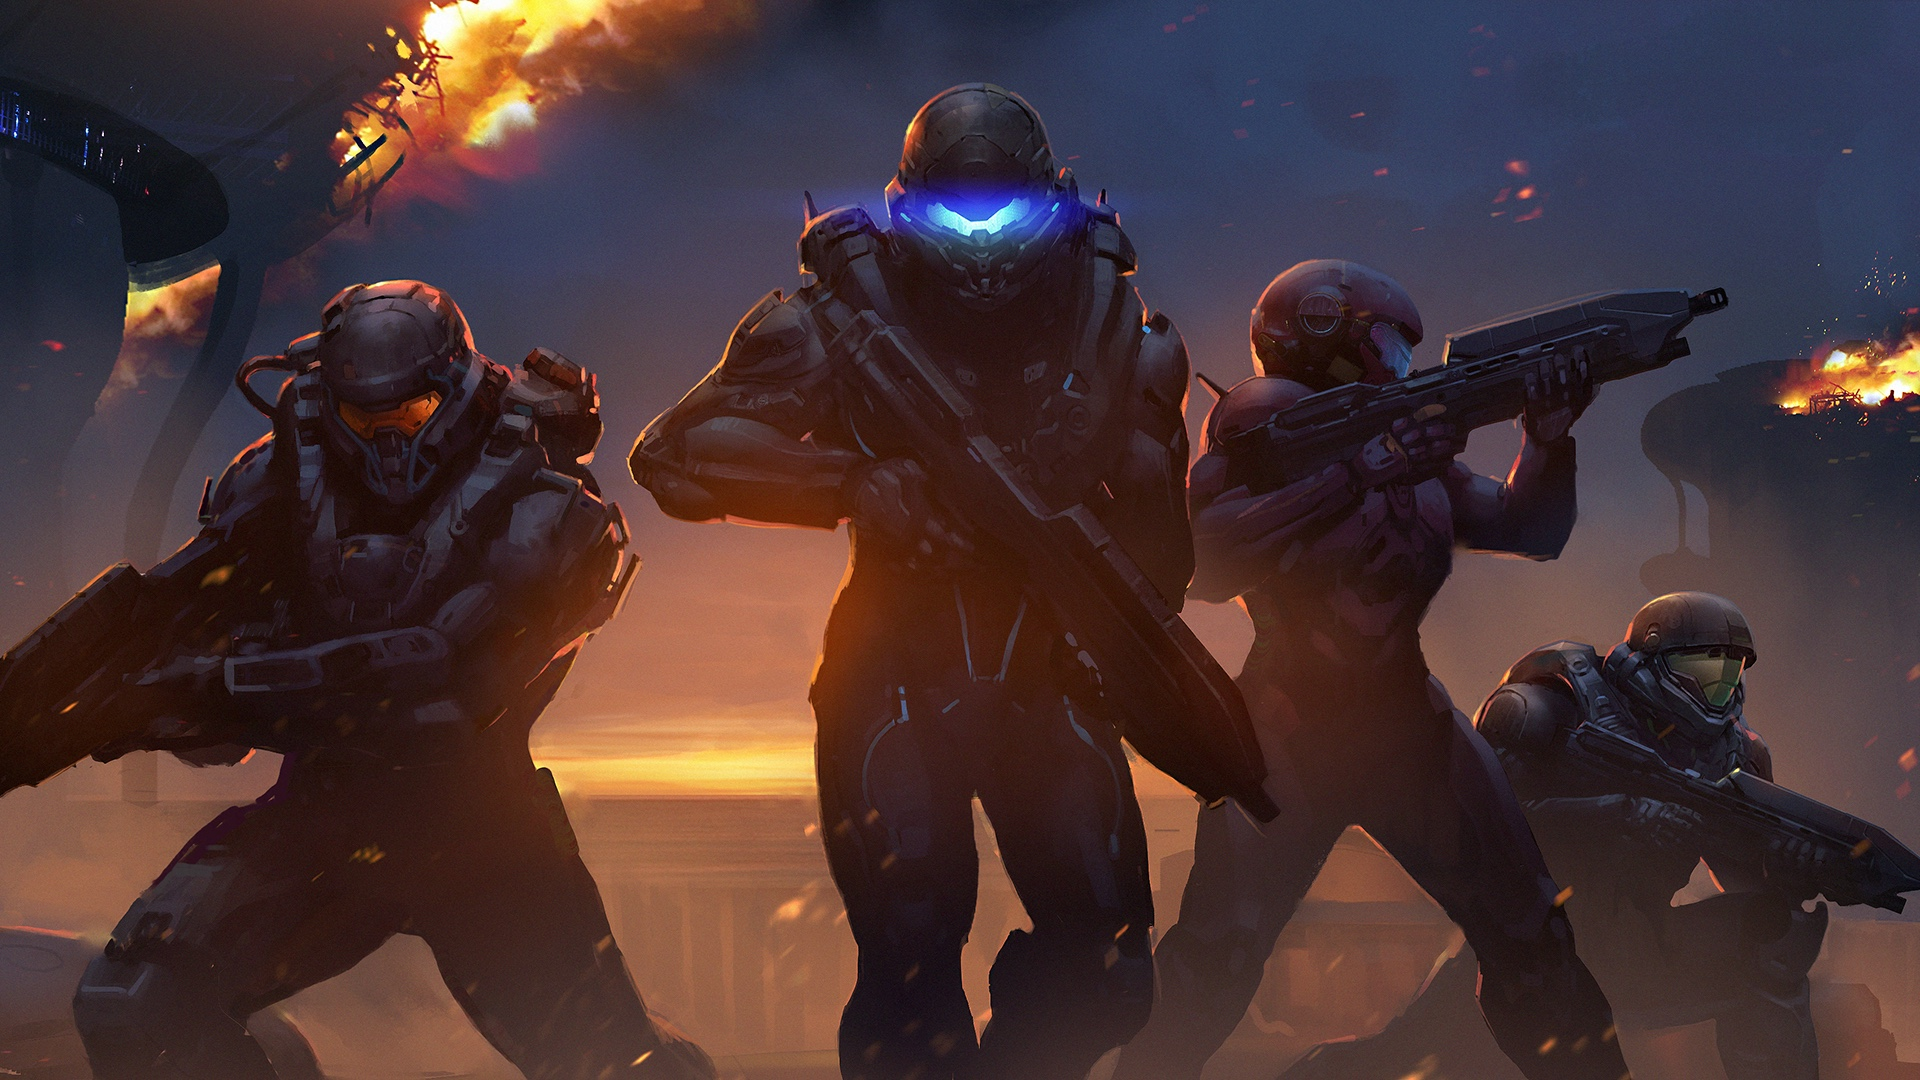 Polygon Live Halo 5 Guardians Polygon E3 2015